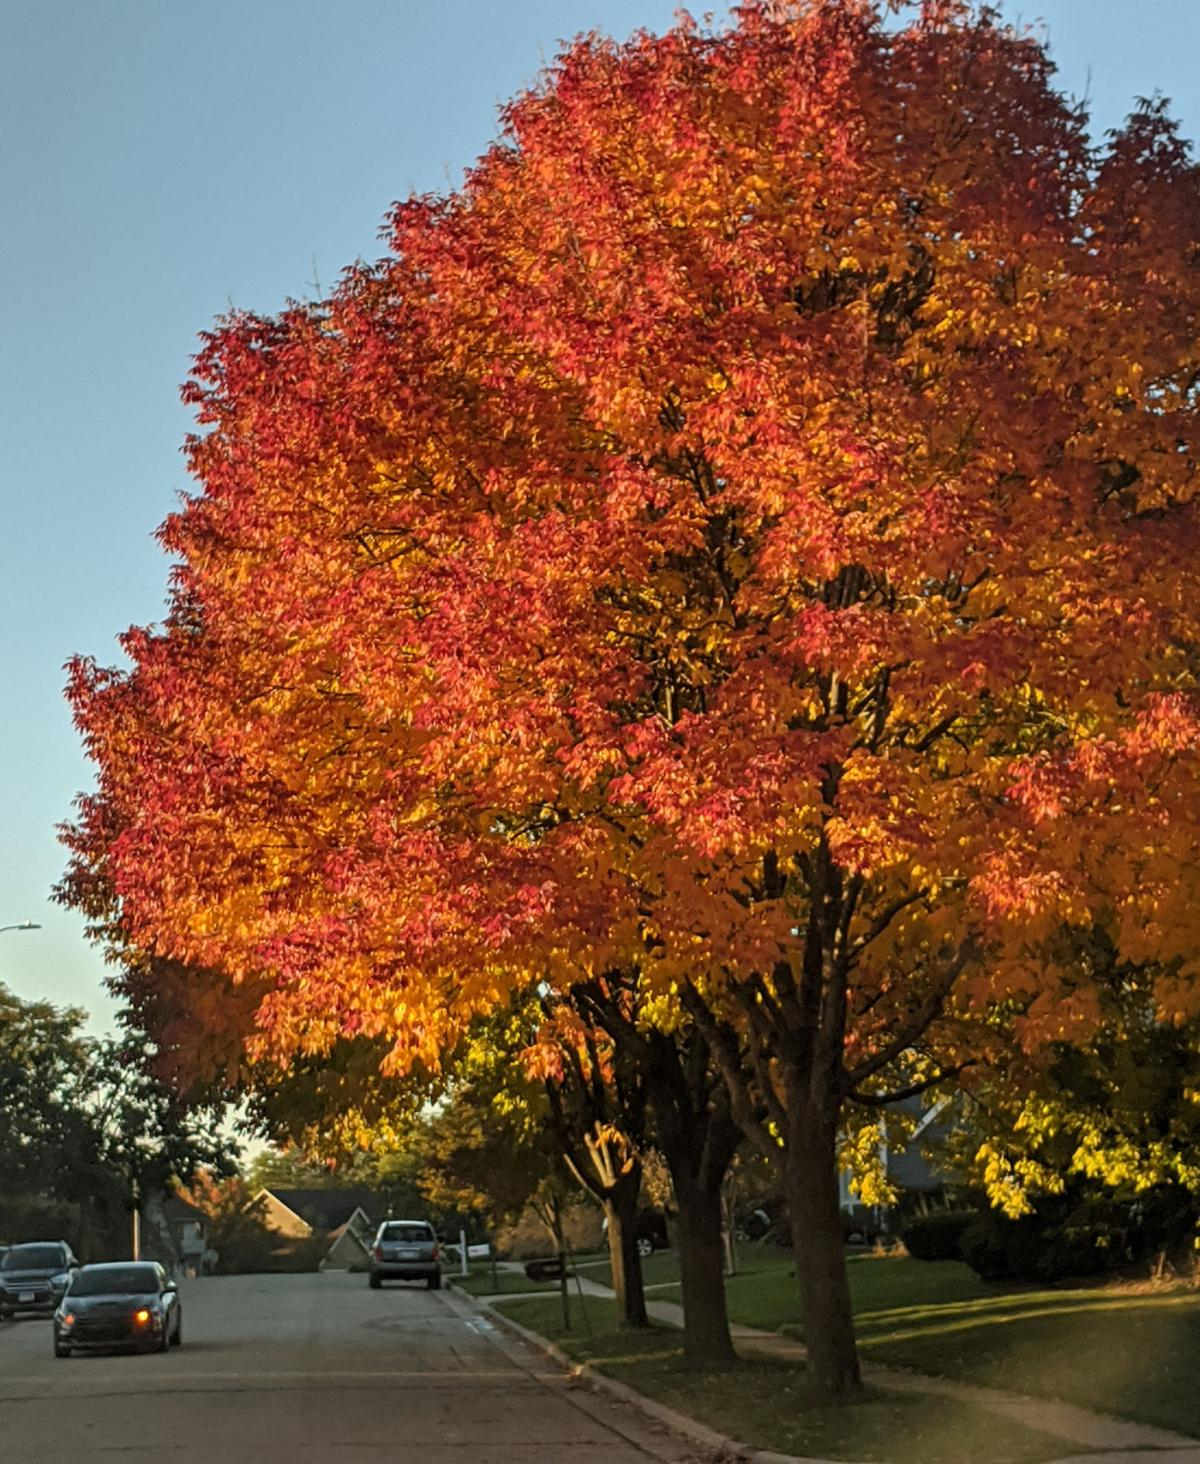 Kenosha fall color street